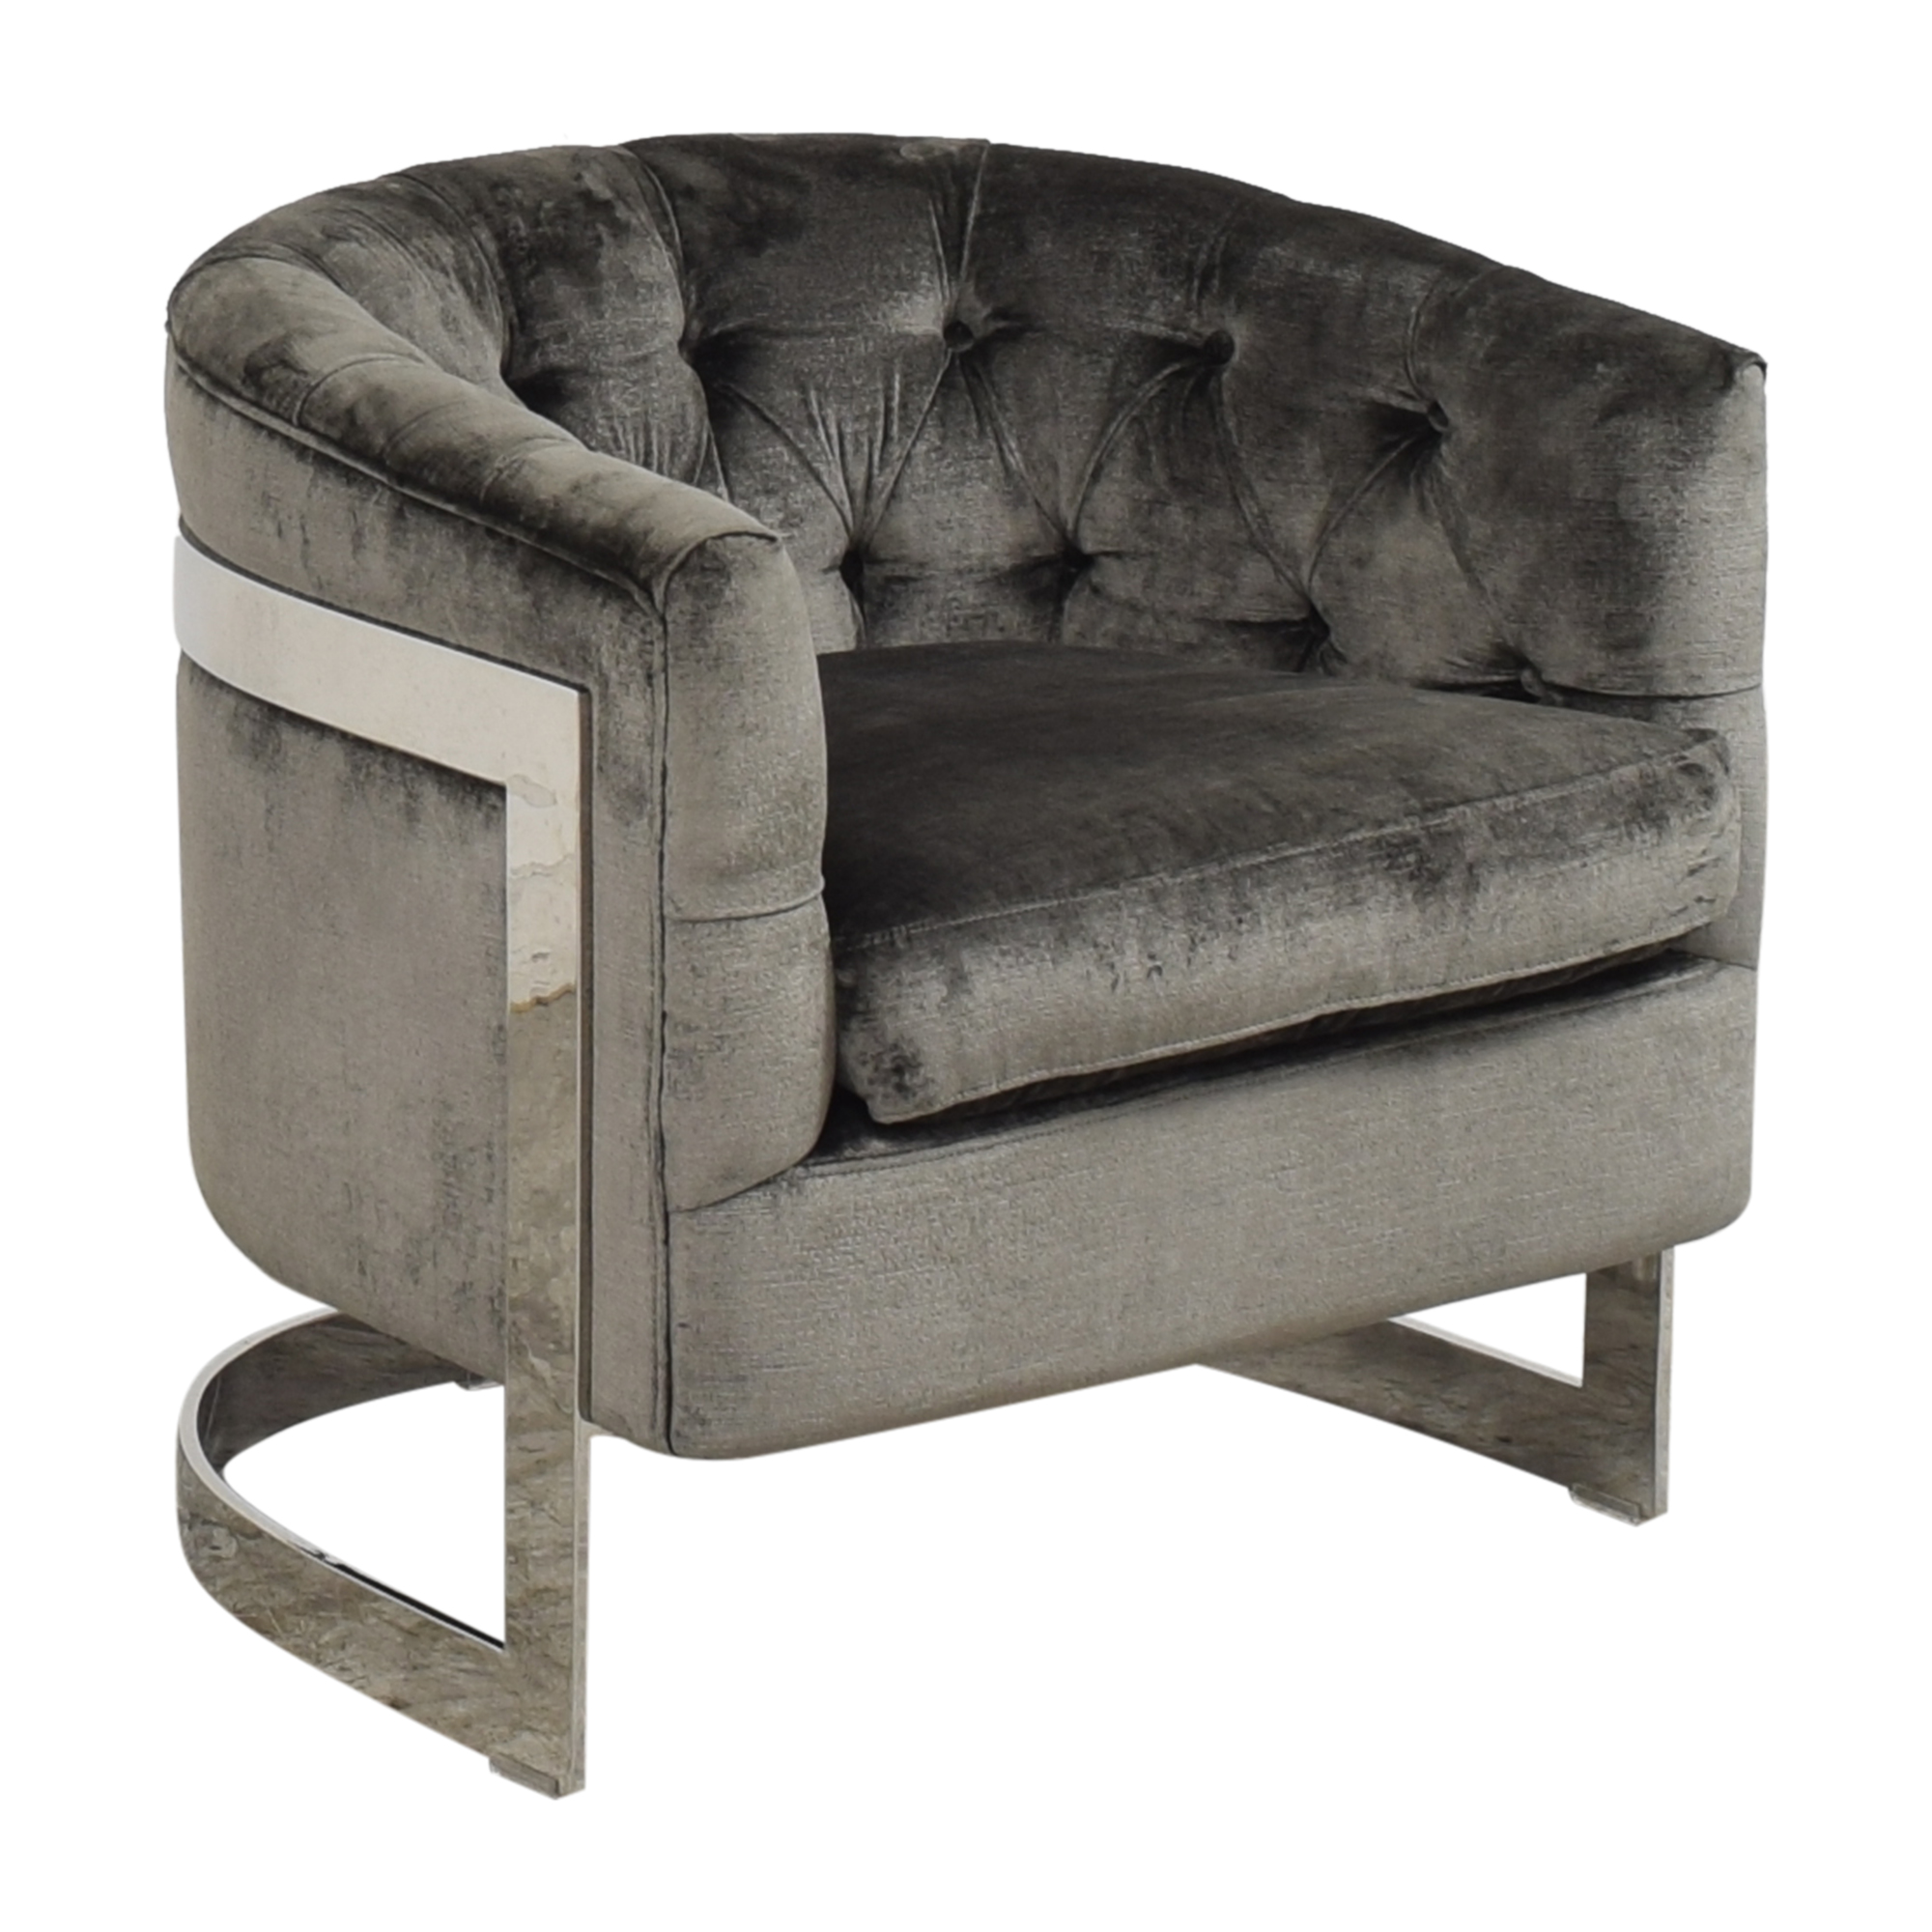 Safavieh Safavieh Zealand Accent Chair nyc